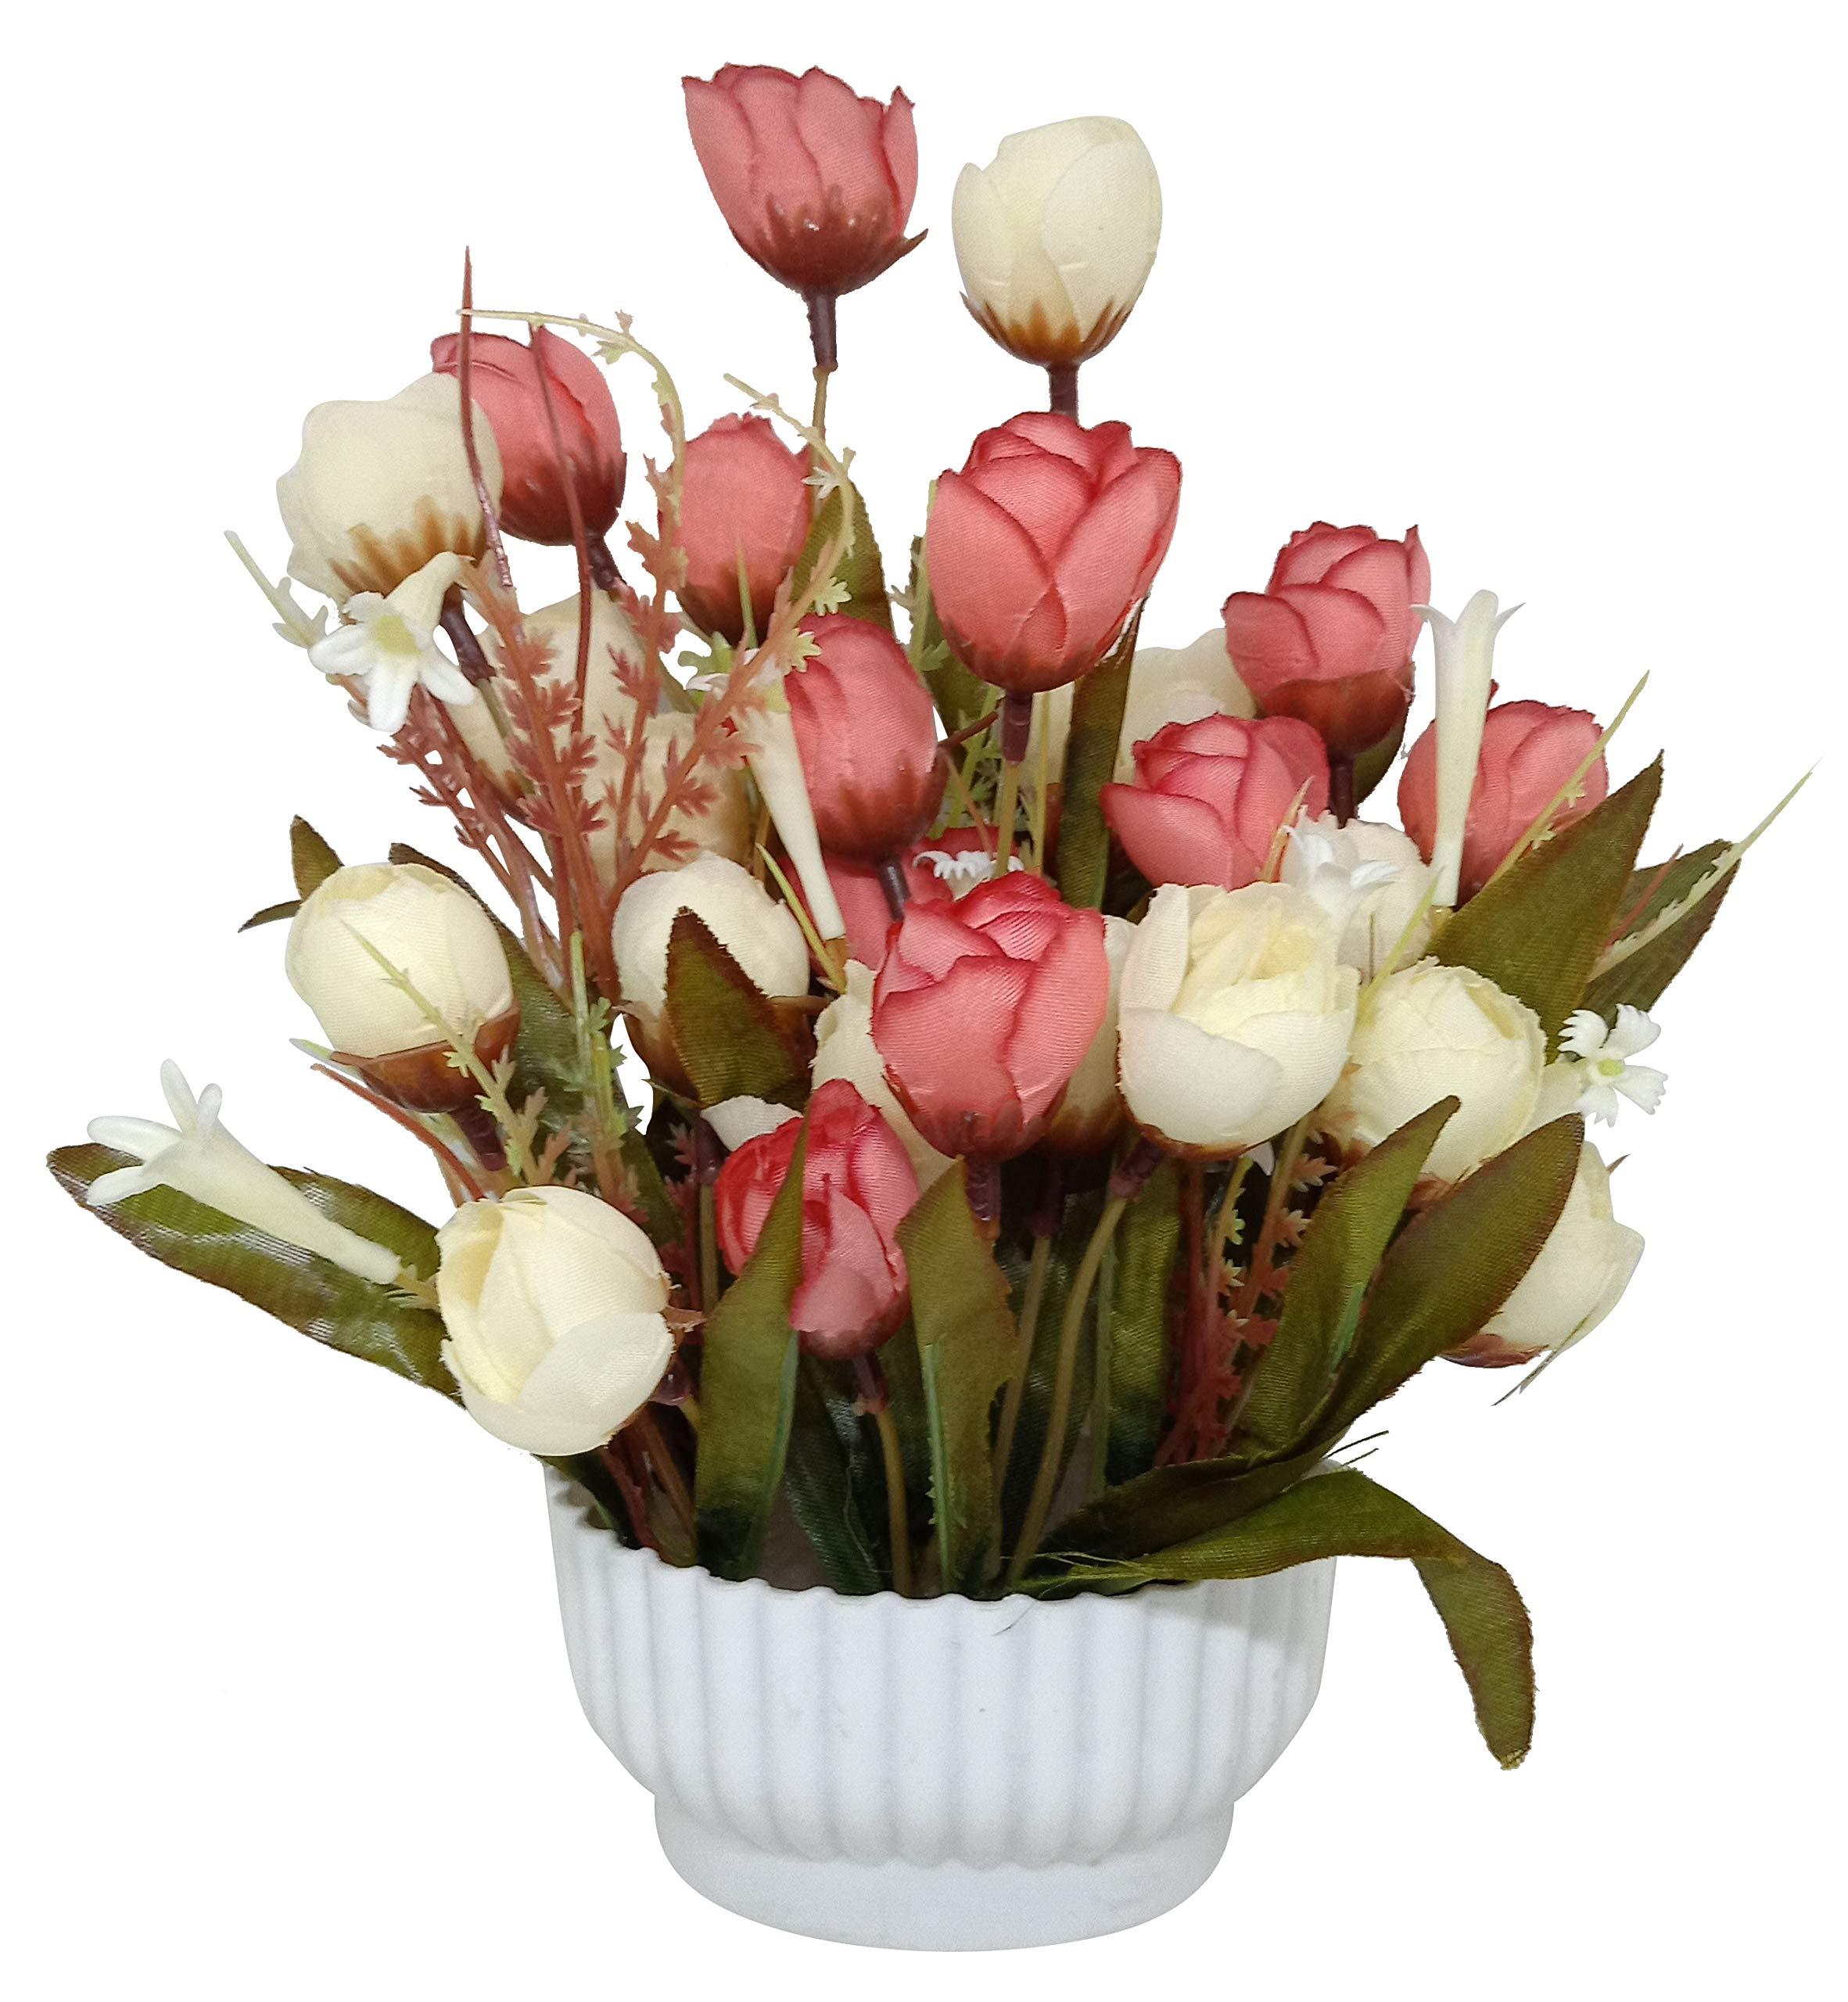 234 & Ethnic Karigari Decorative Beautiful Indoor Natural Looking Artificial Flower Vase Artificial Flower with Melamine Pot